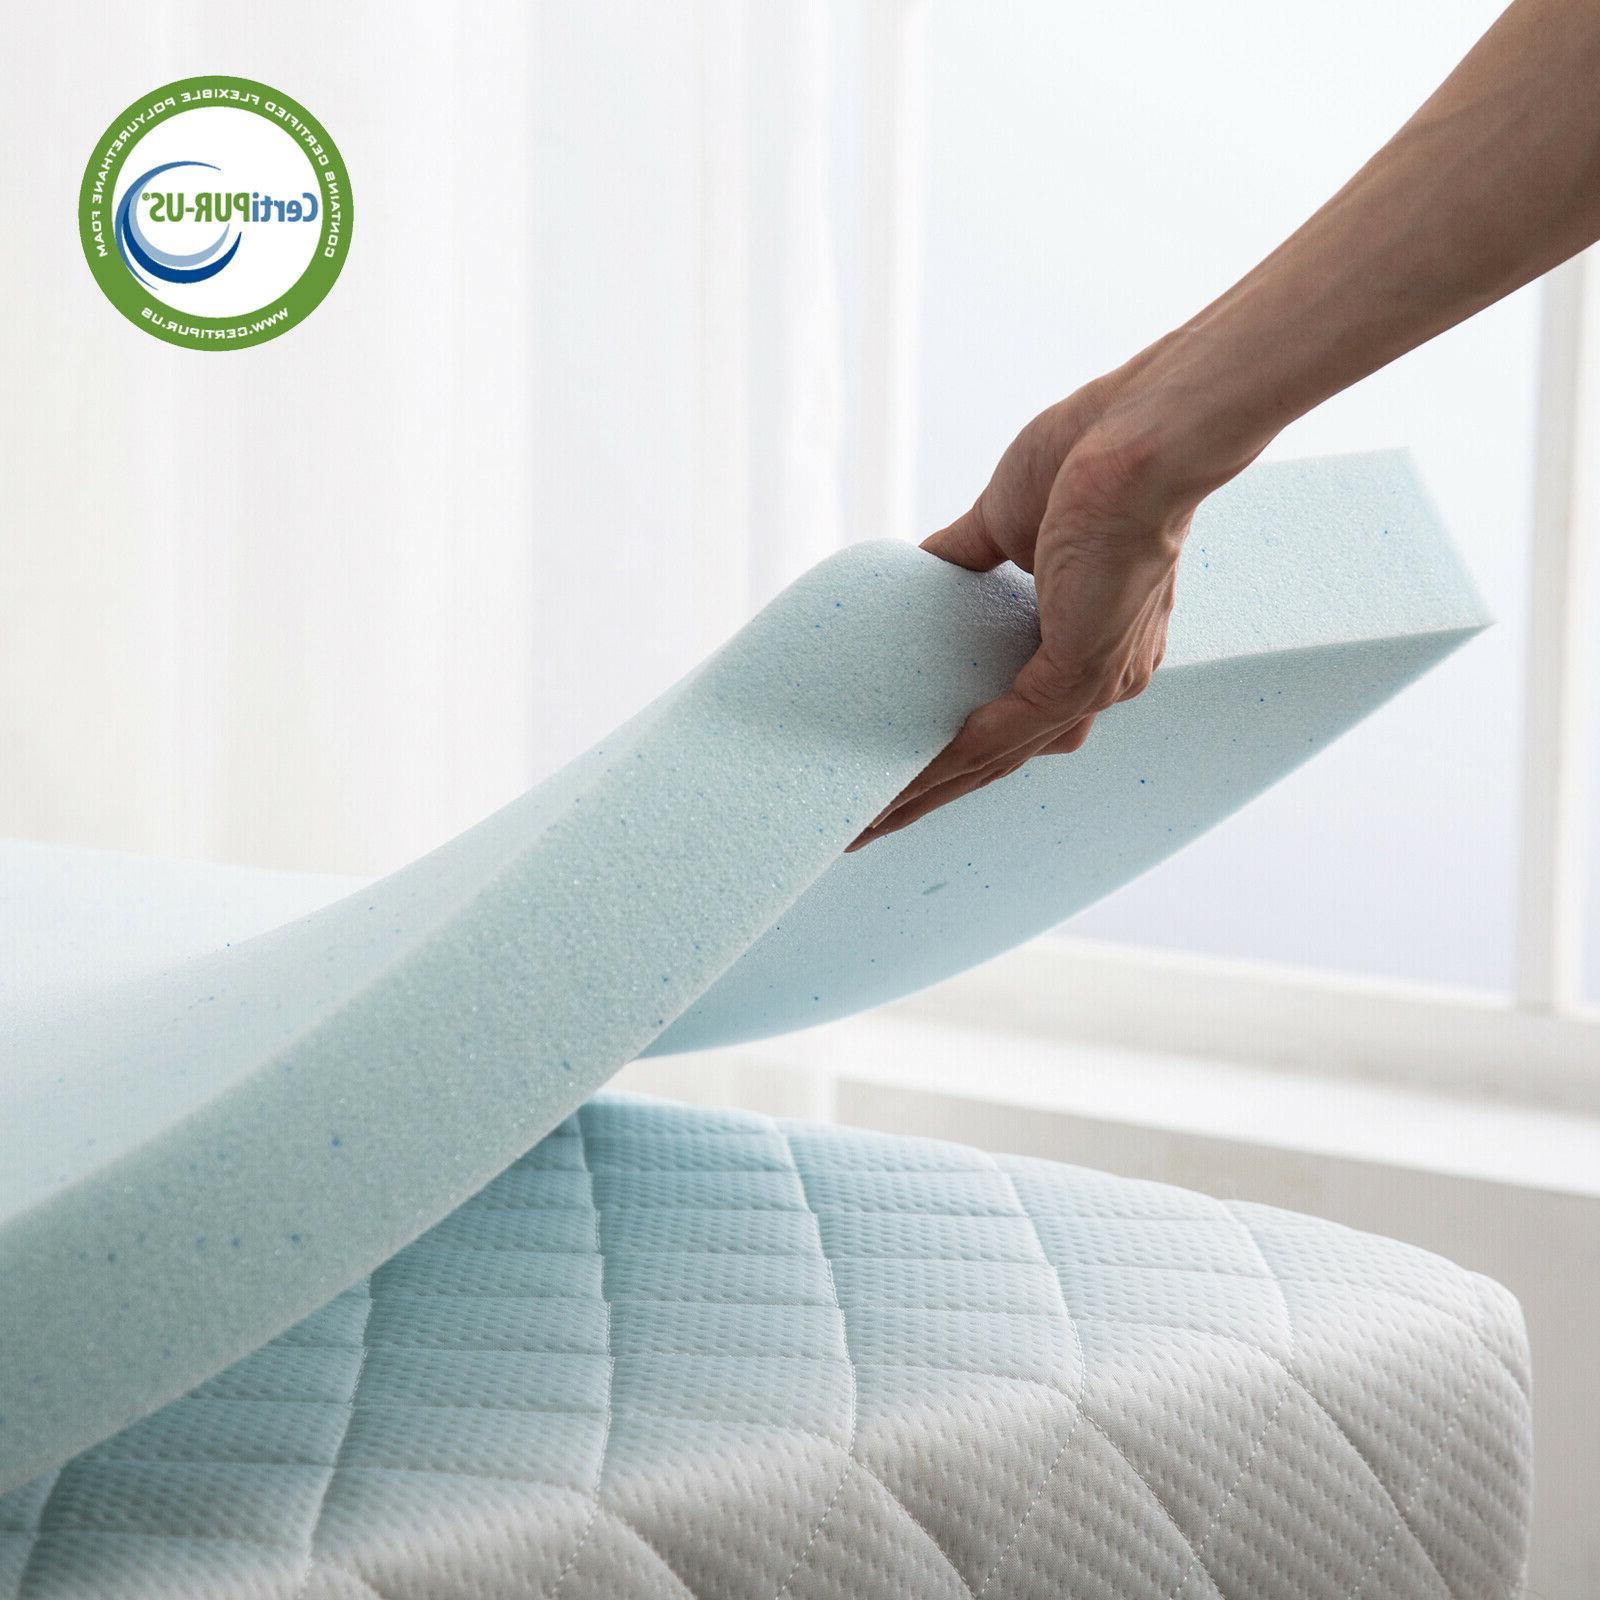 2 5 3 memory foam mattress topper